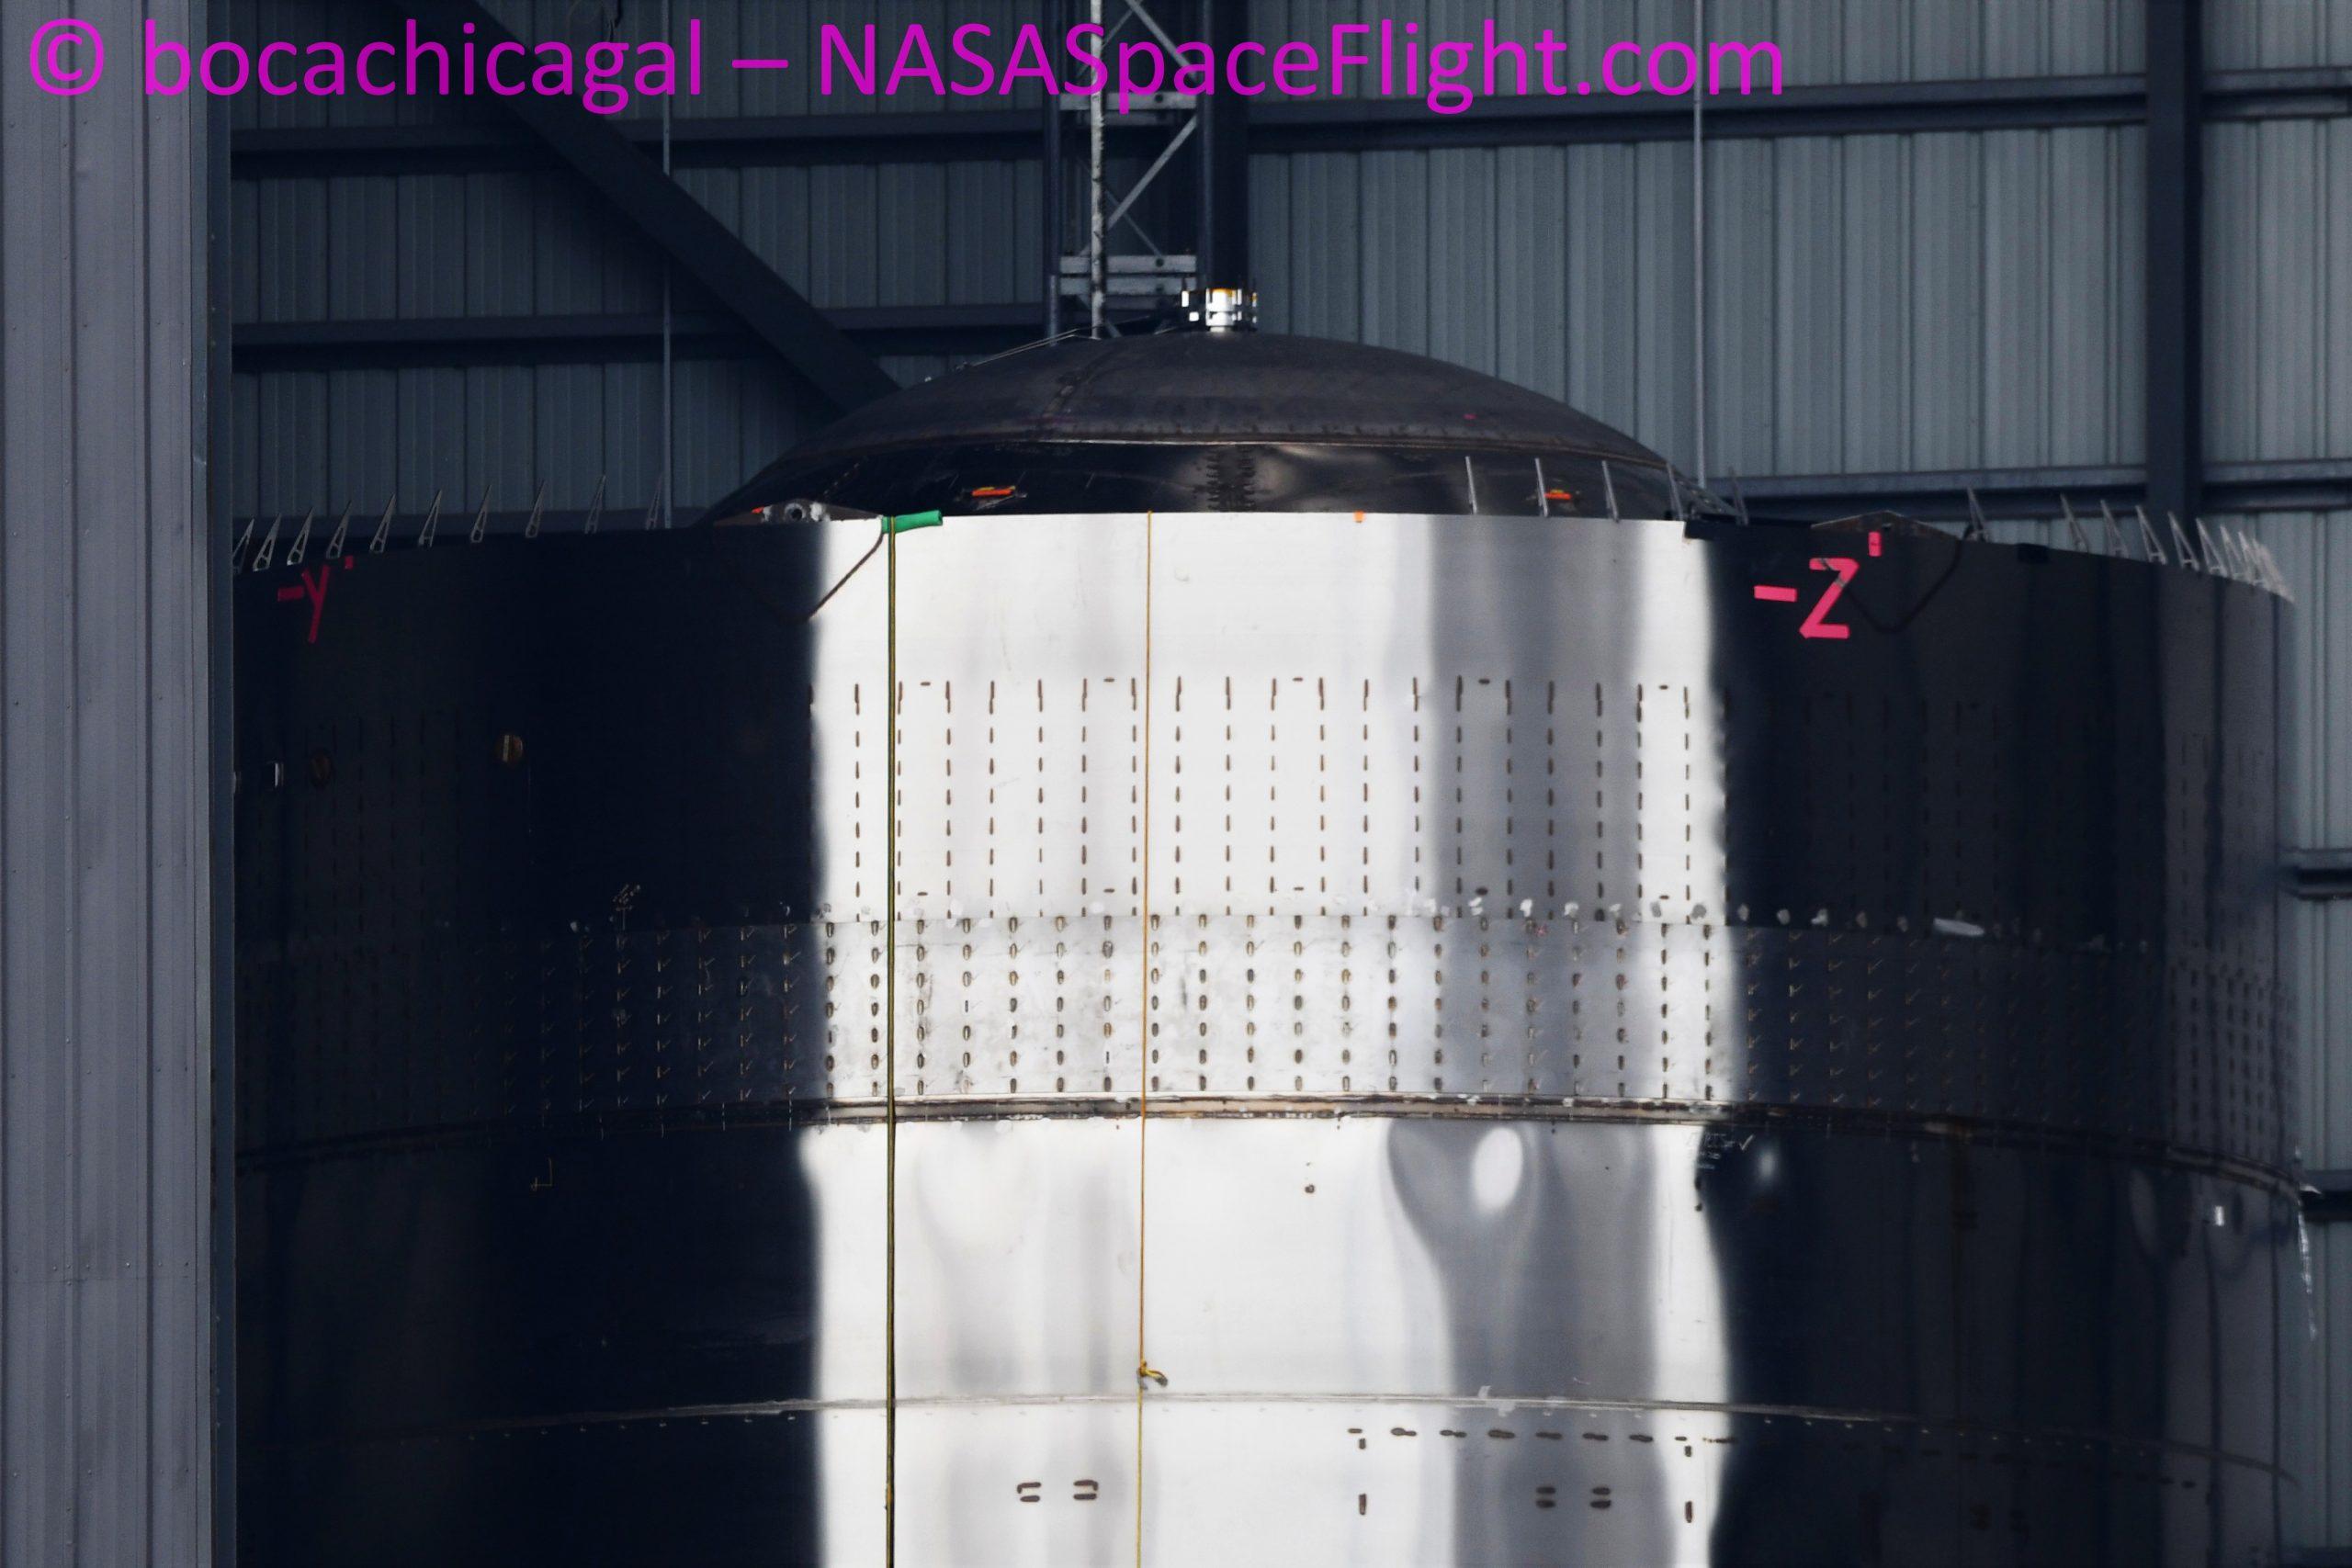 Starship Boca Chica 091320 (NASASpaceflight – bocachicagal) SN8 1